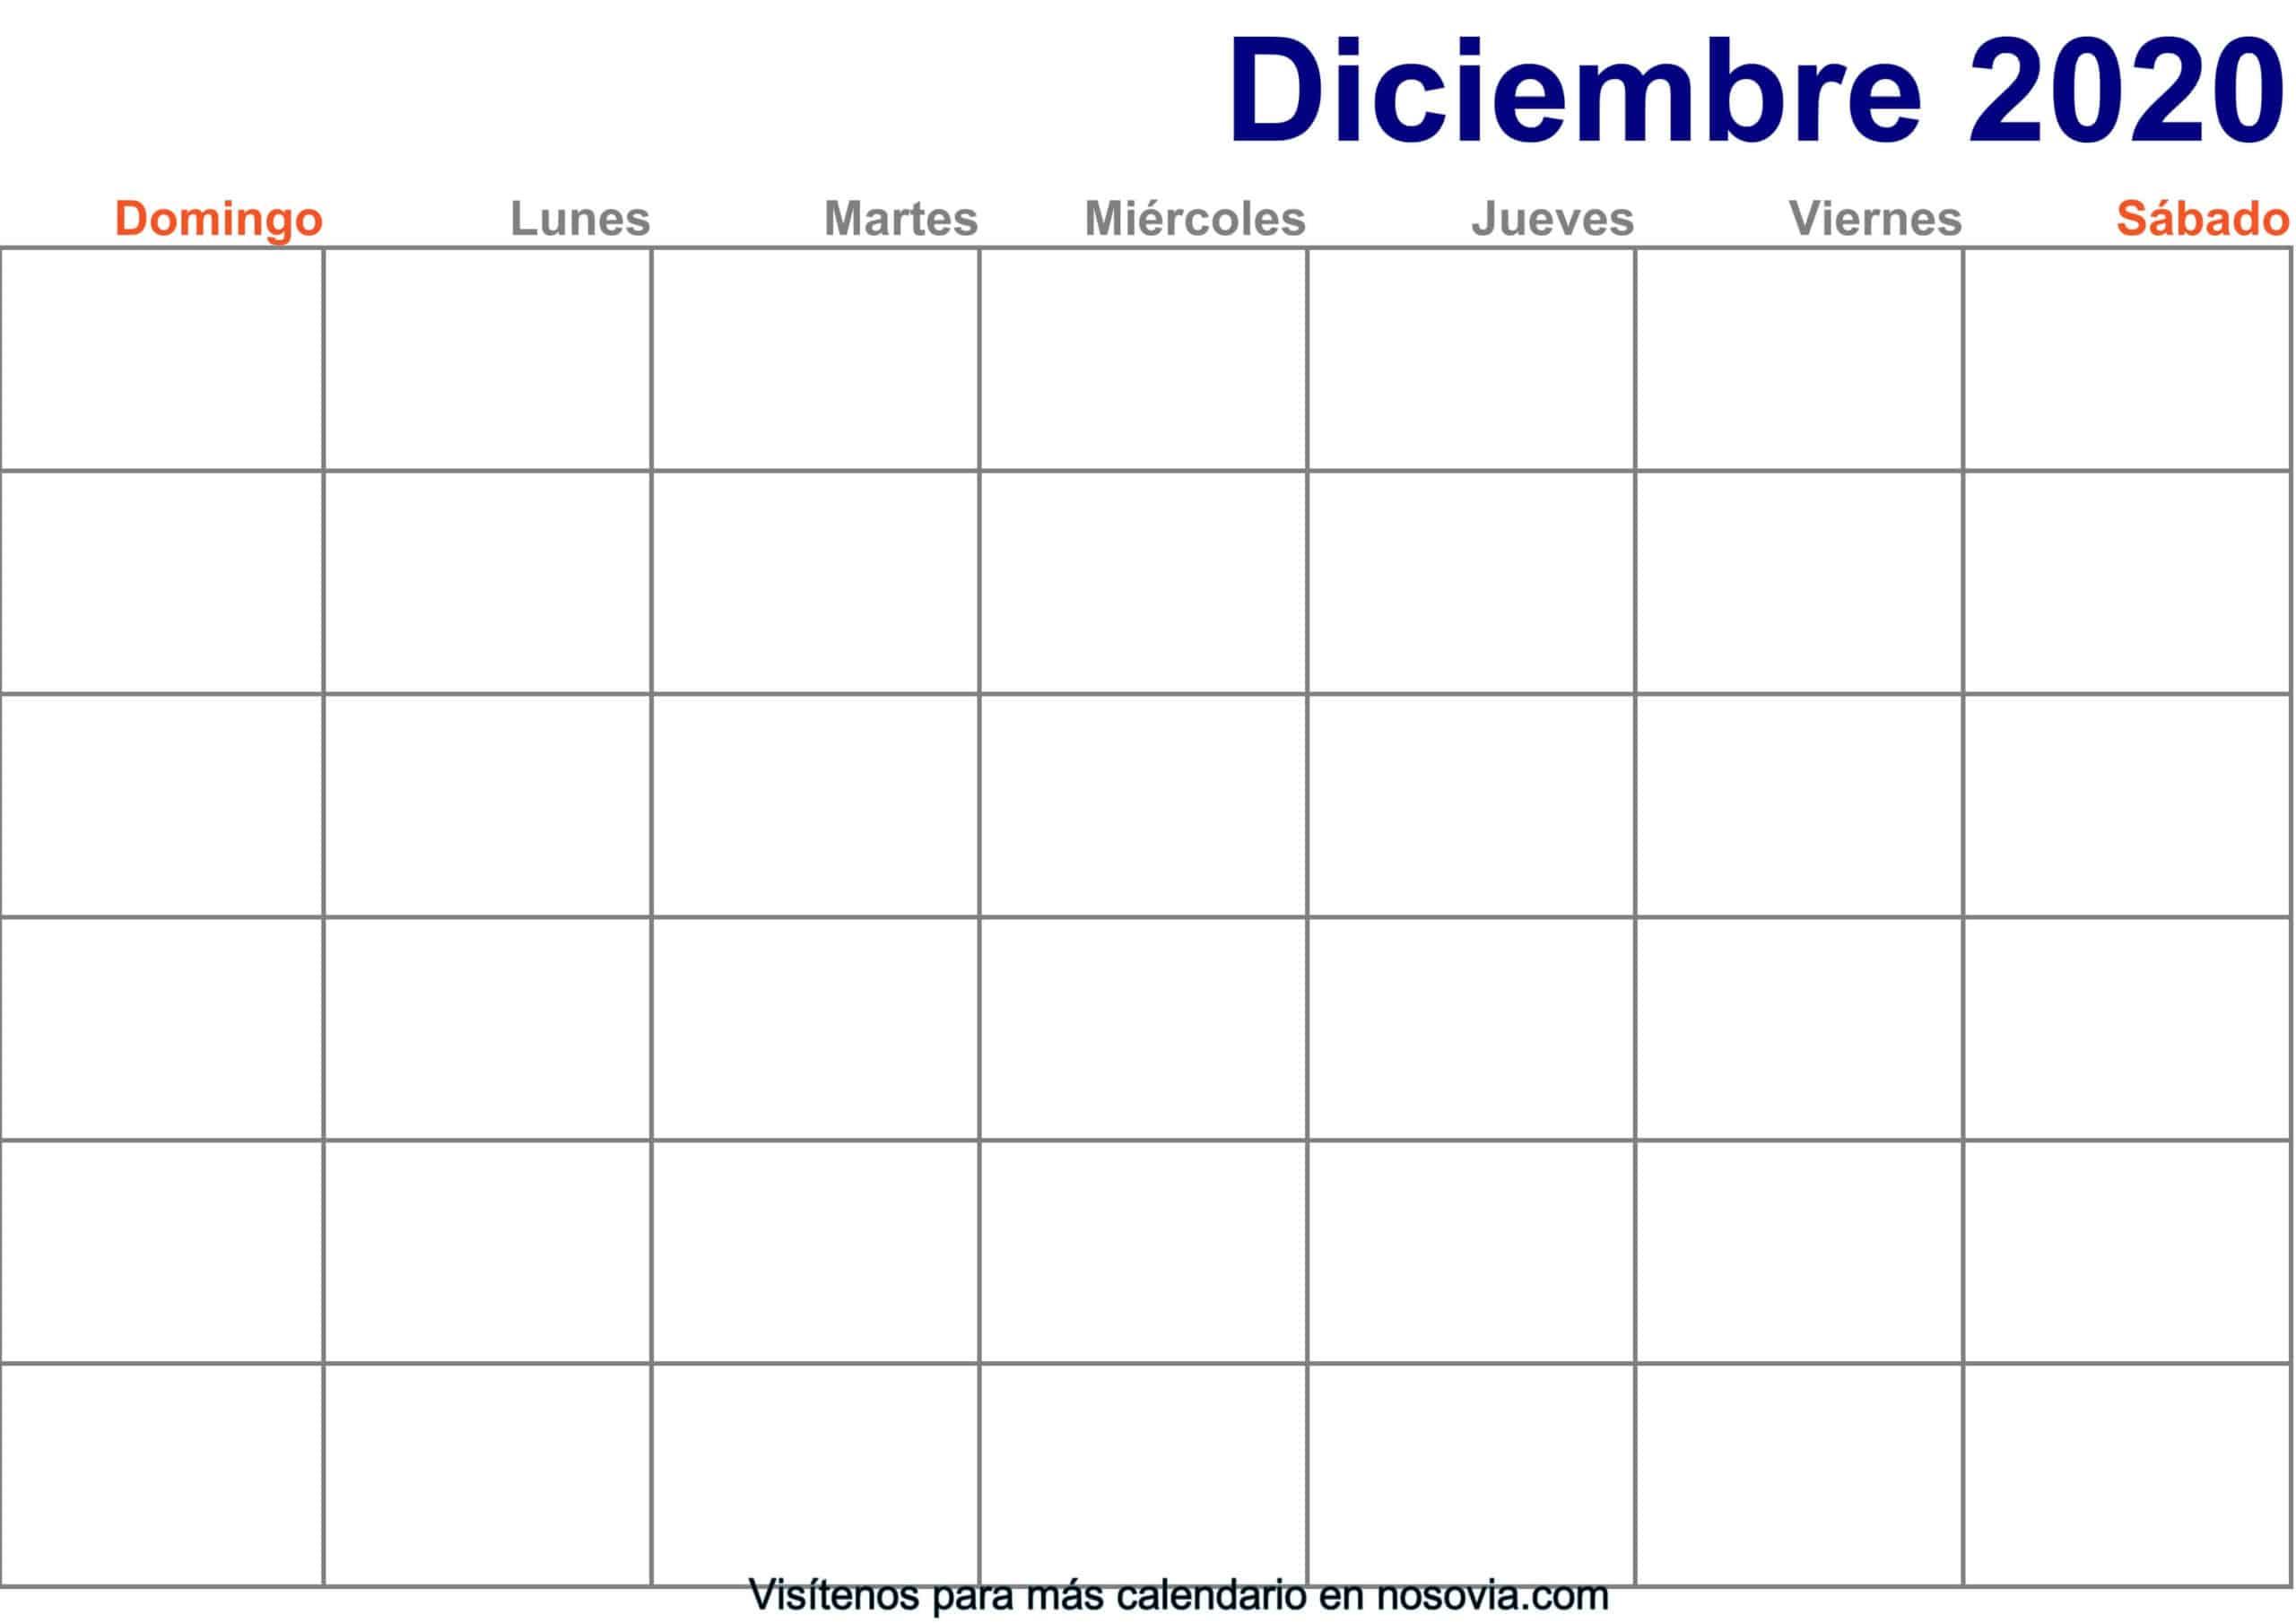 Calendario-diciembre-2020-en-blanco-Imprimir-gratis